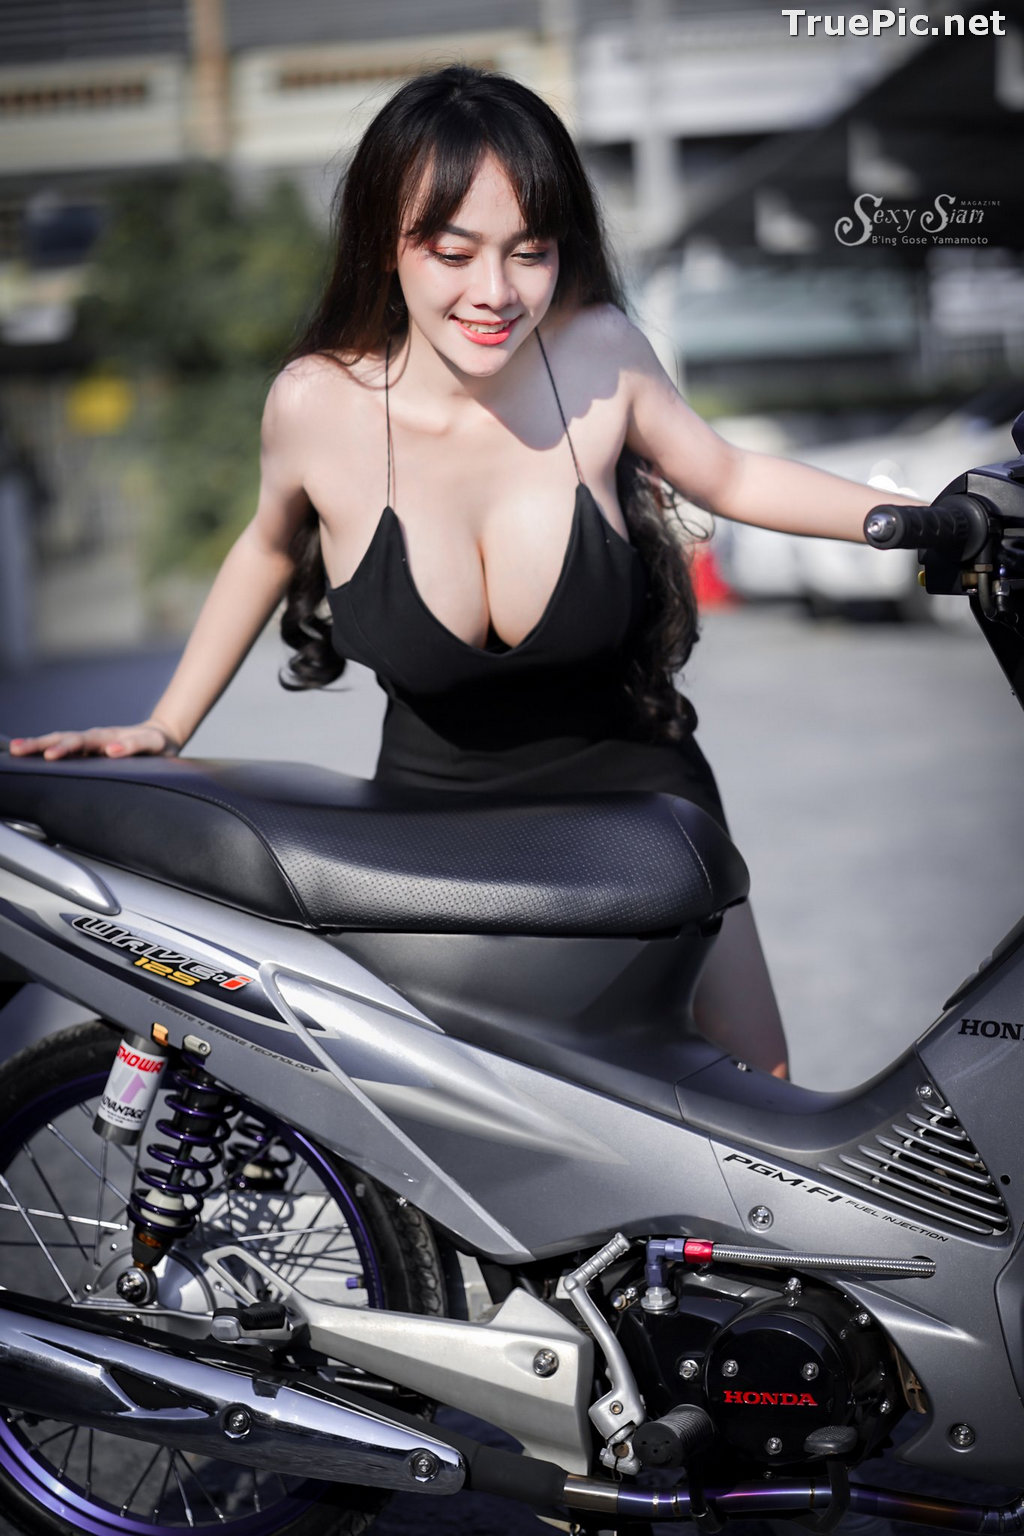 Image Thailand Model - จุ๊ปเปอร์ จุ๊ป - Sexy Black Car Girl - TruePic.net - Picture-9